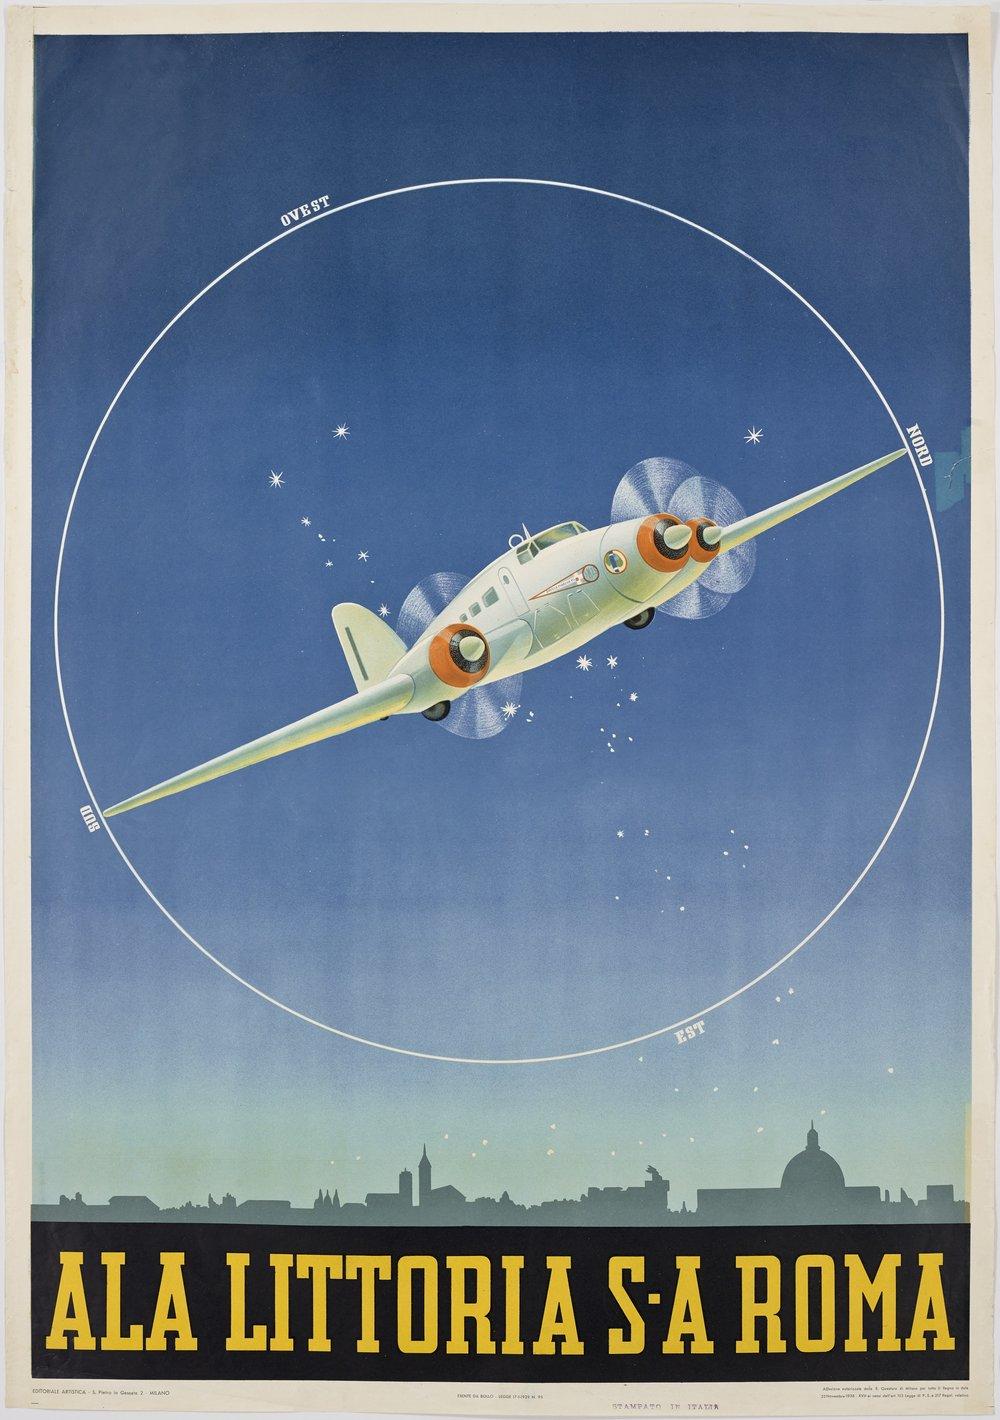 Vintage Airline travel posters Vintage cookbooks00056.jpg